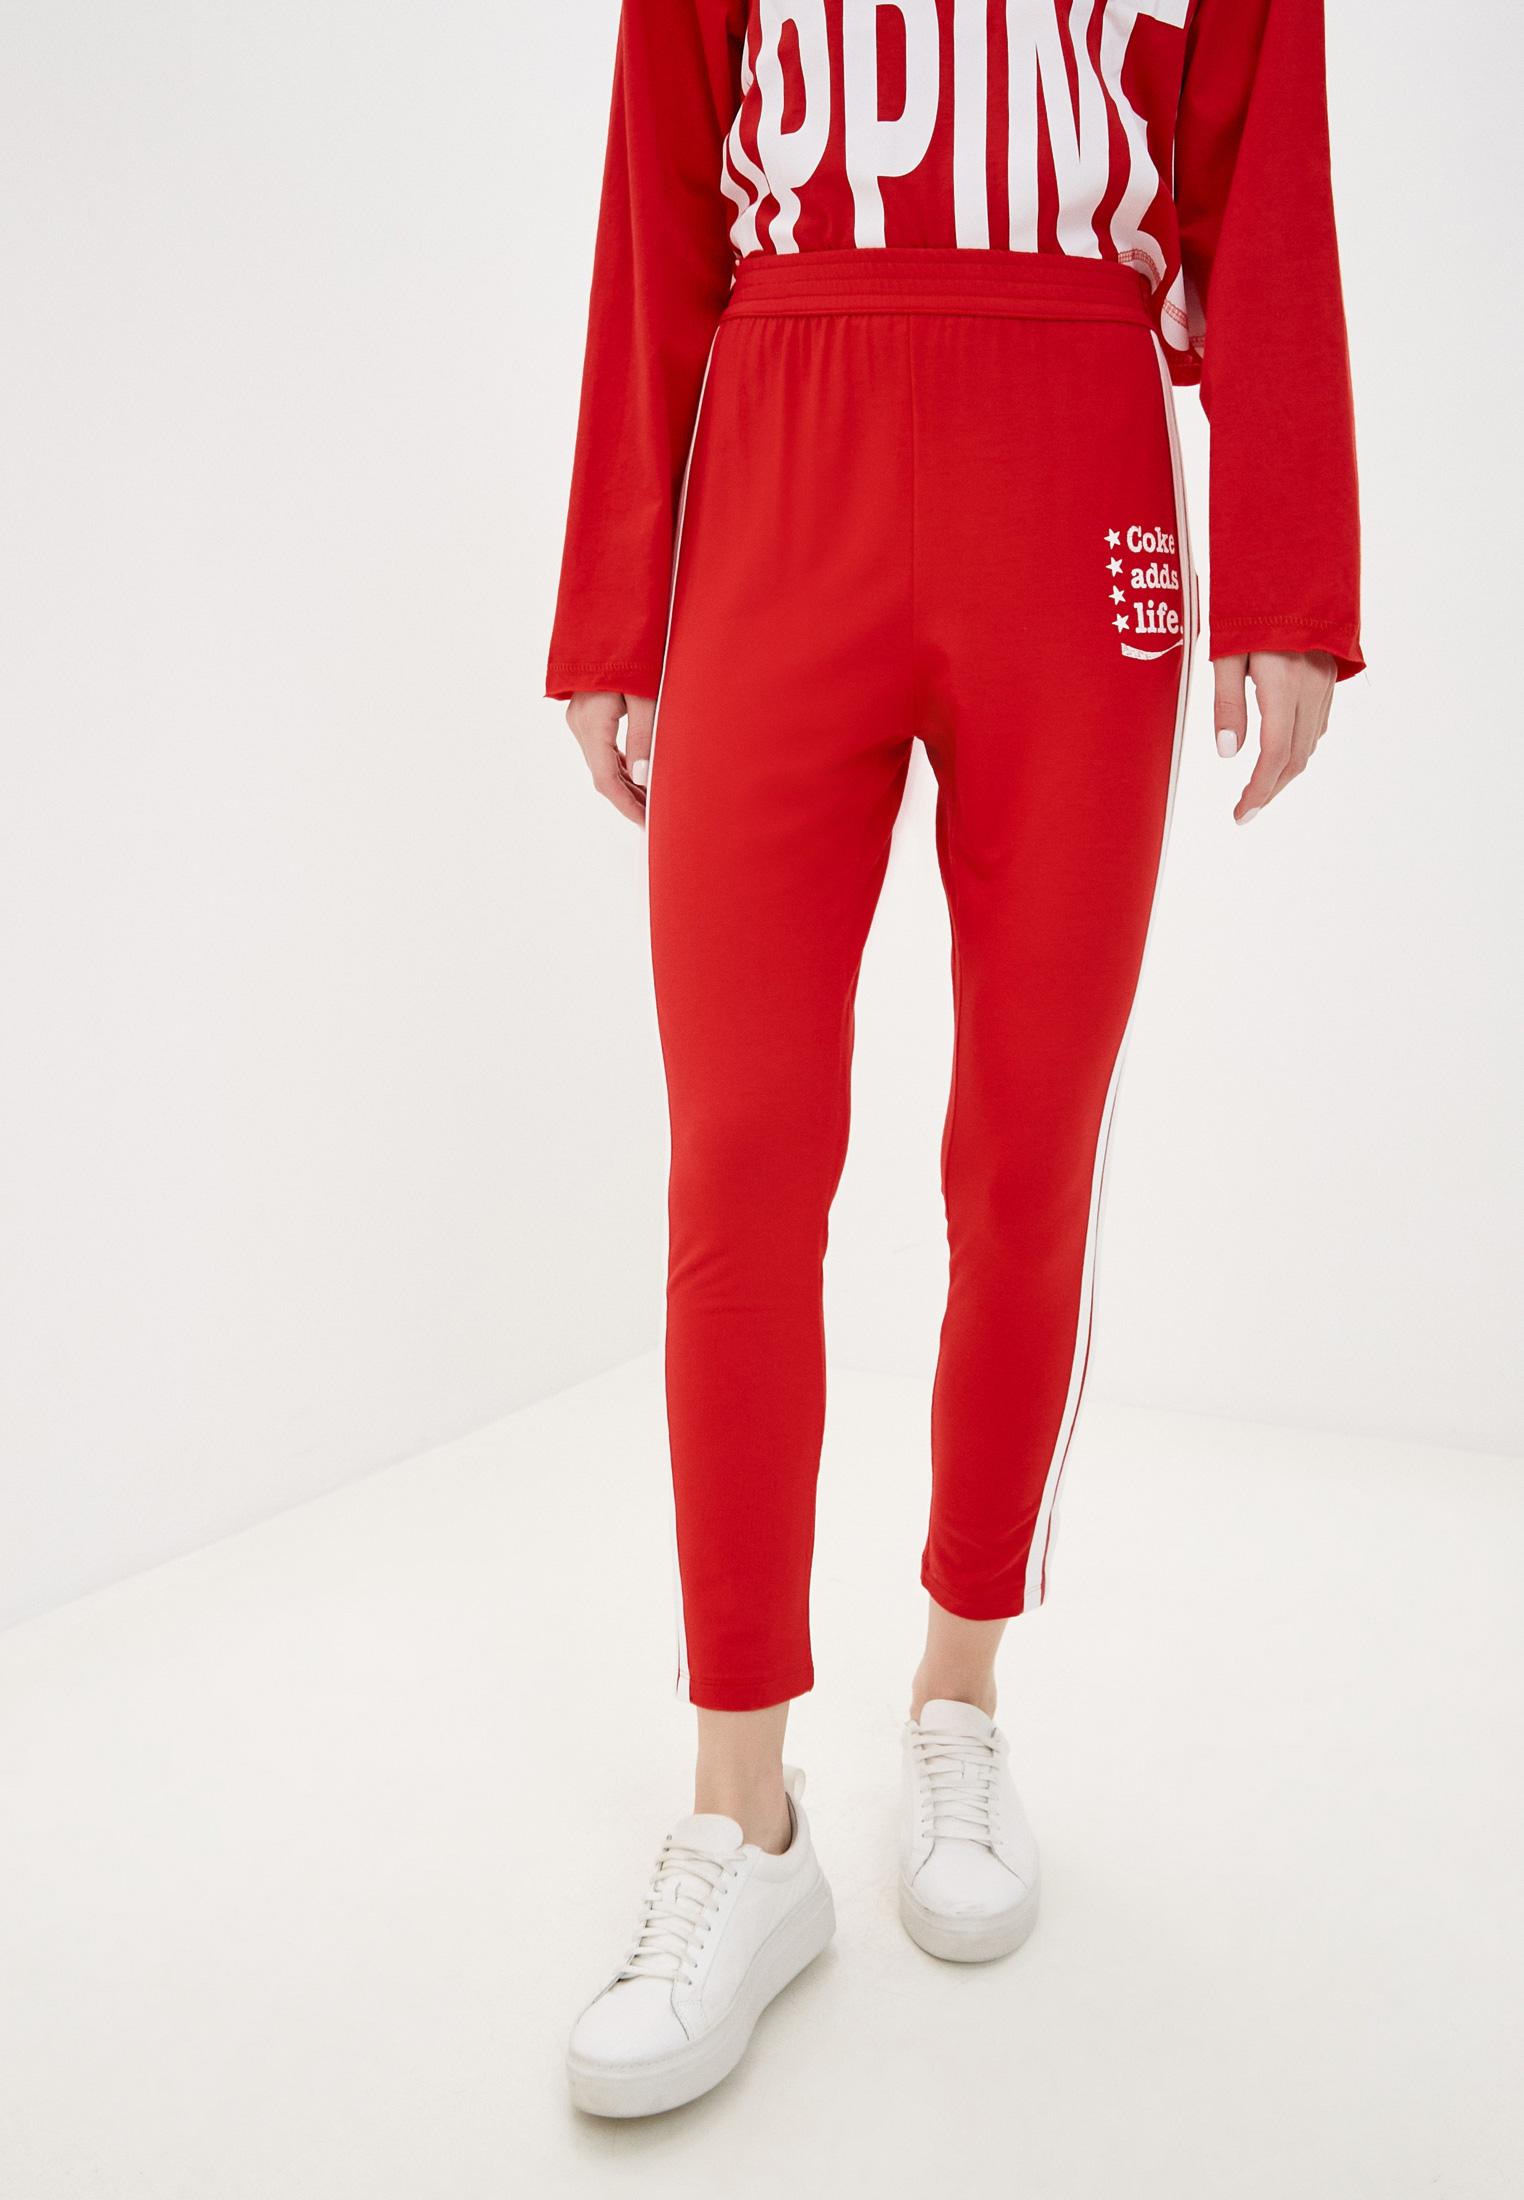 Женские спортивные брюки Coca Cola Jeans 002.32.02945